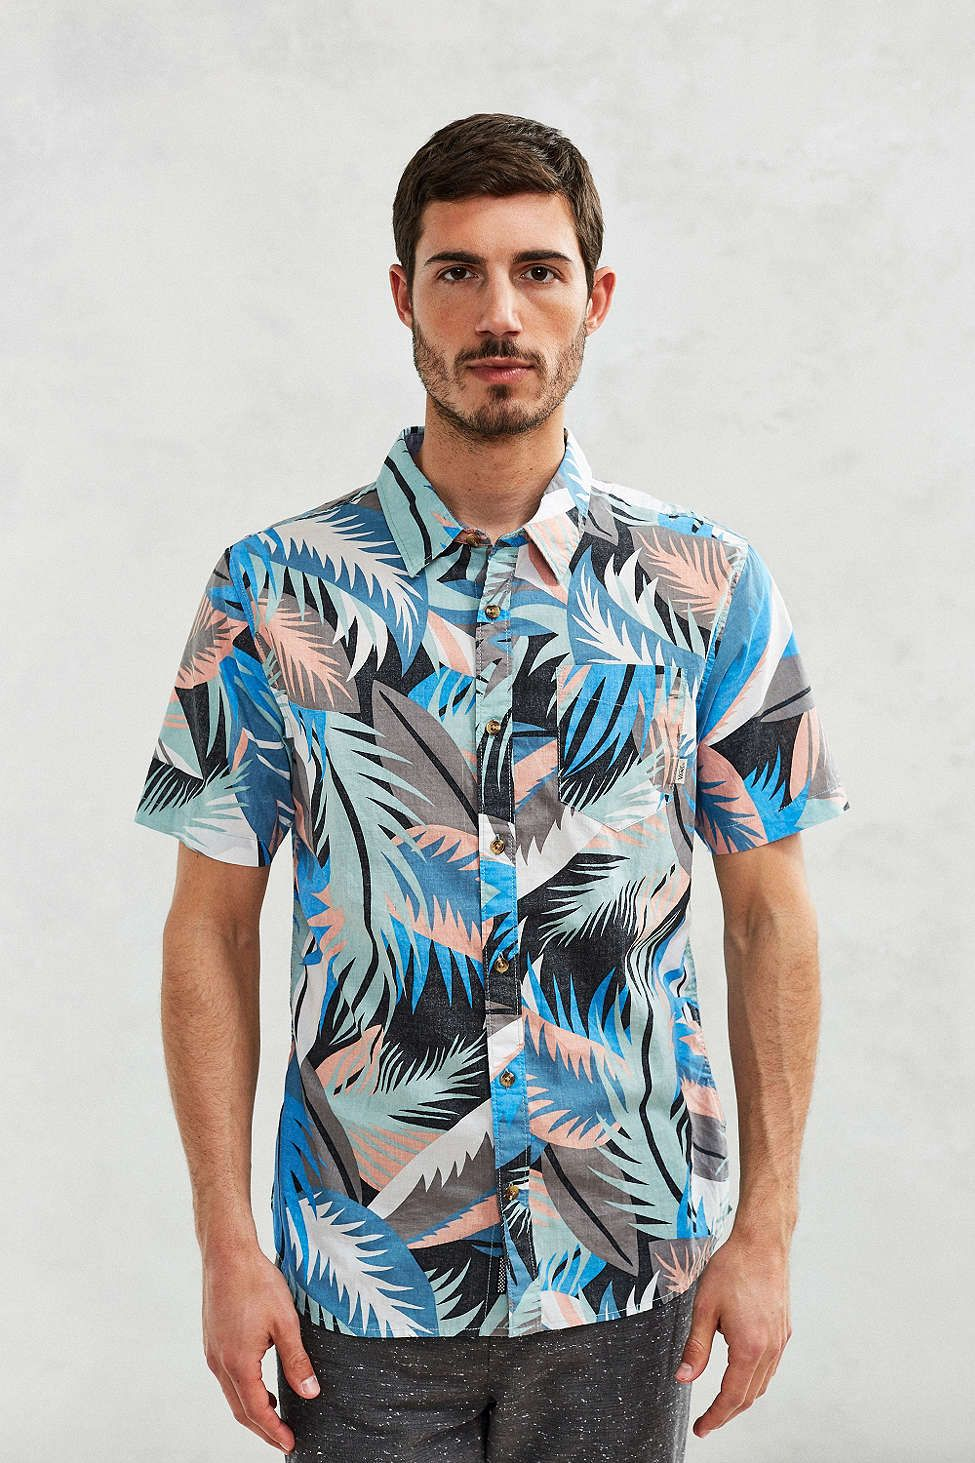 Flannel shirt with shorts  Vans Cosgrove Canton Stanton Floral ShortSleeve ButtonDown Shirt